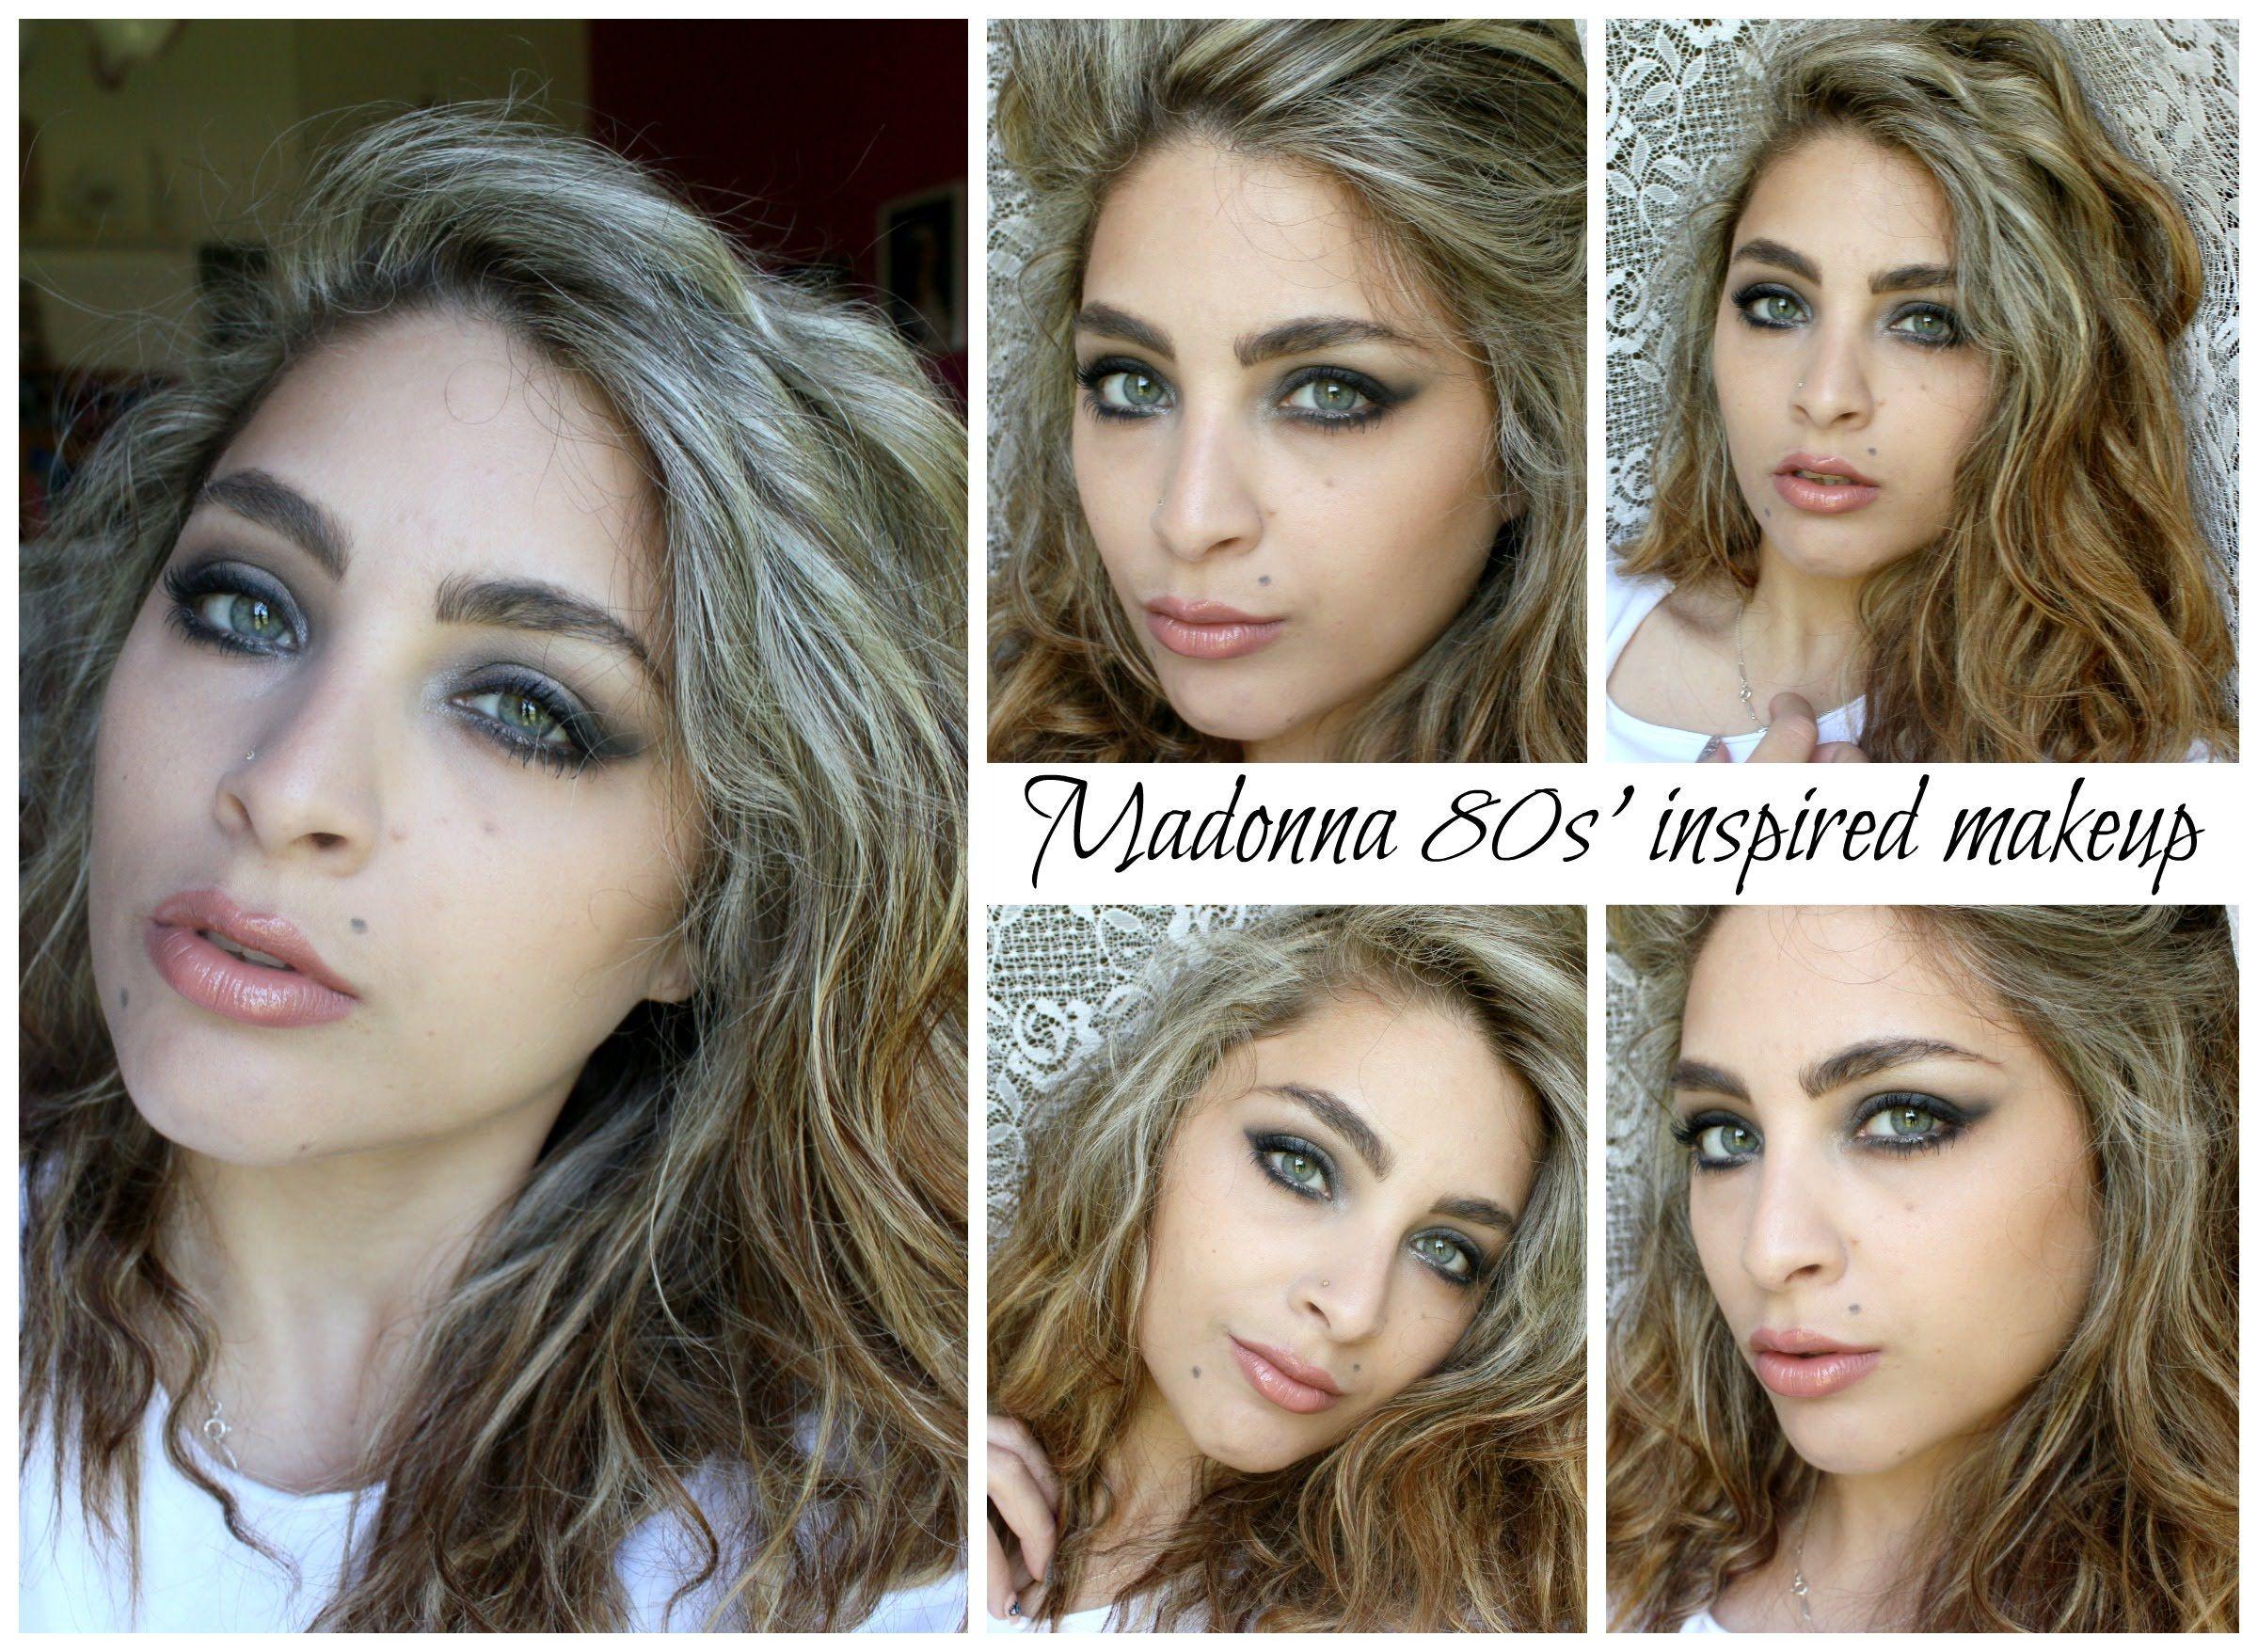 Madonna Eye Makeup 80s Google Search Costuming Madonna 80s